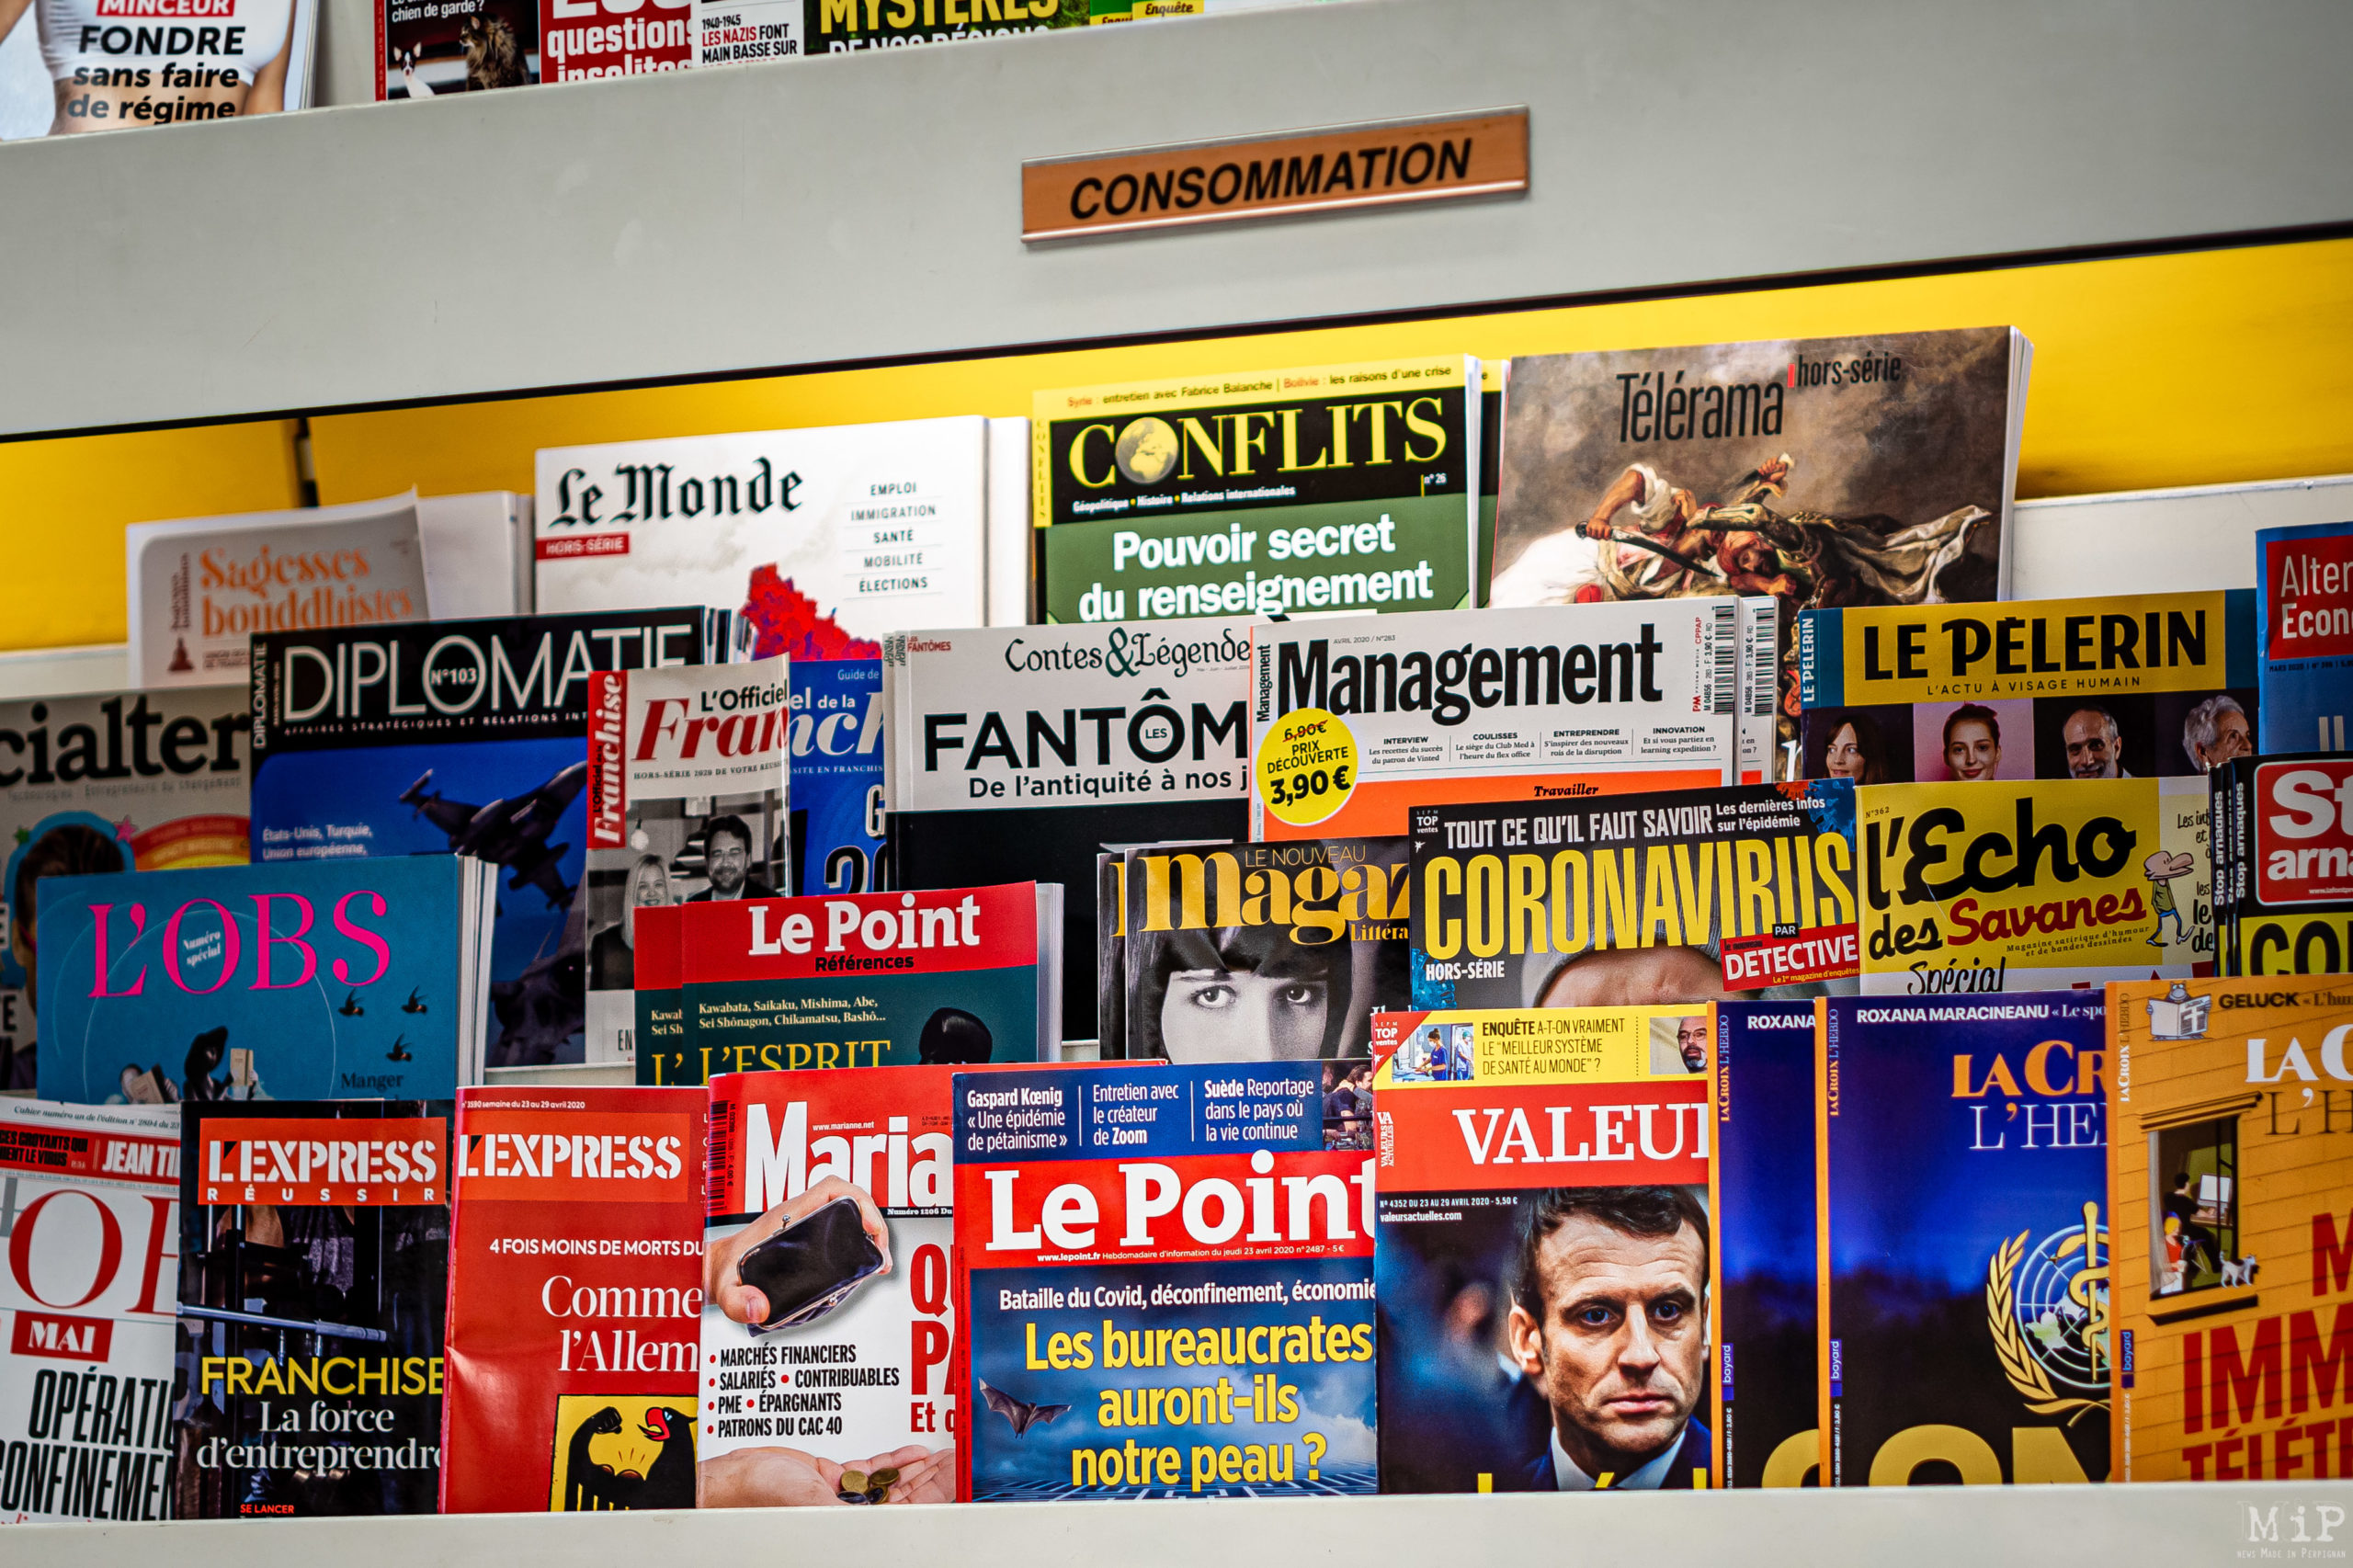 25/04/2020, Perpignan, France, Illustration Coronavirus Covid-19 vie quotidienne © Arnaud Le Vu / MiP / APM